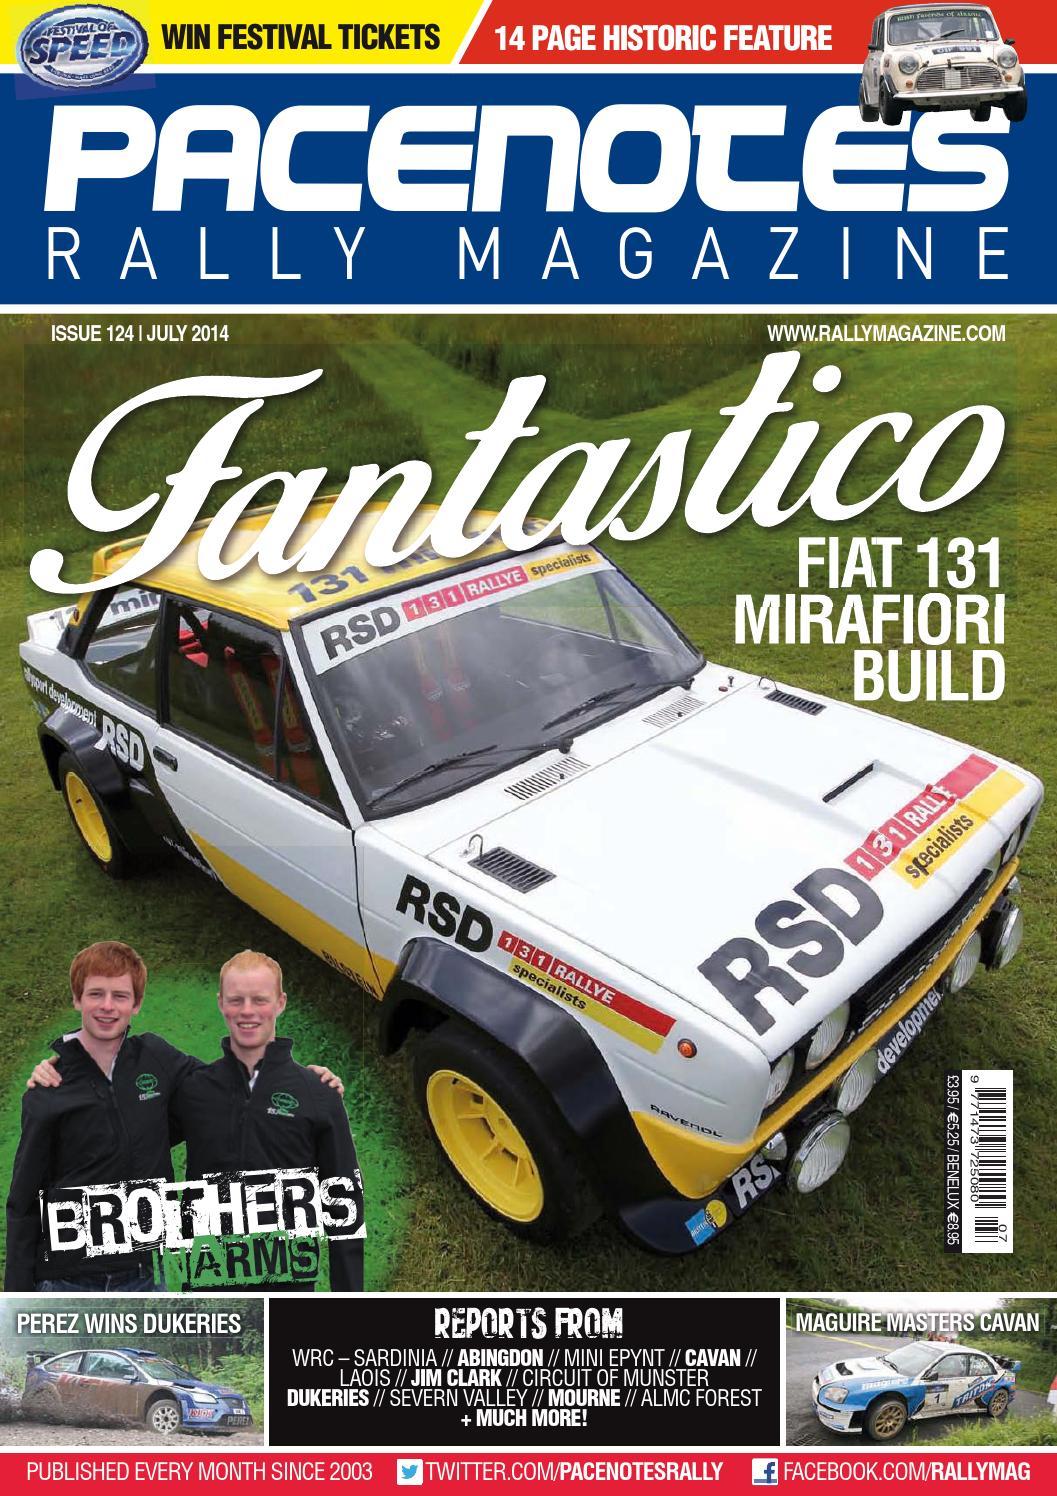 Original Ford Atlas axle oil filler plug for Capri Cortina Rally Race cars etc